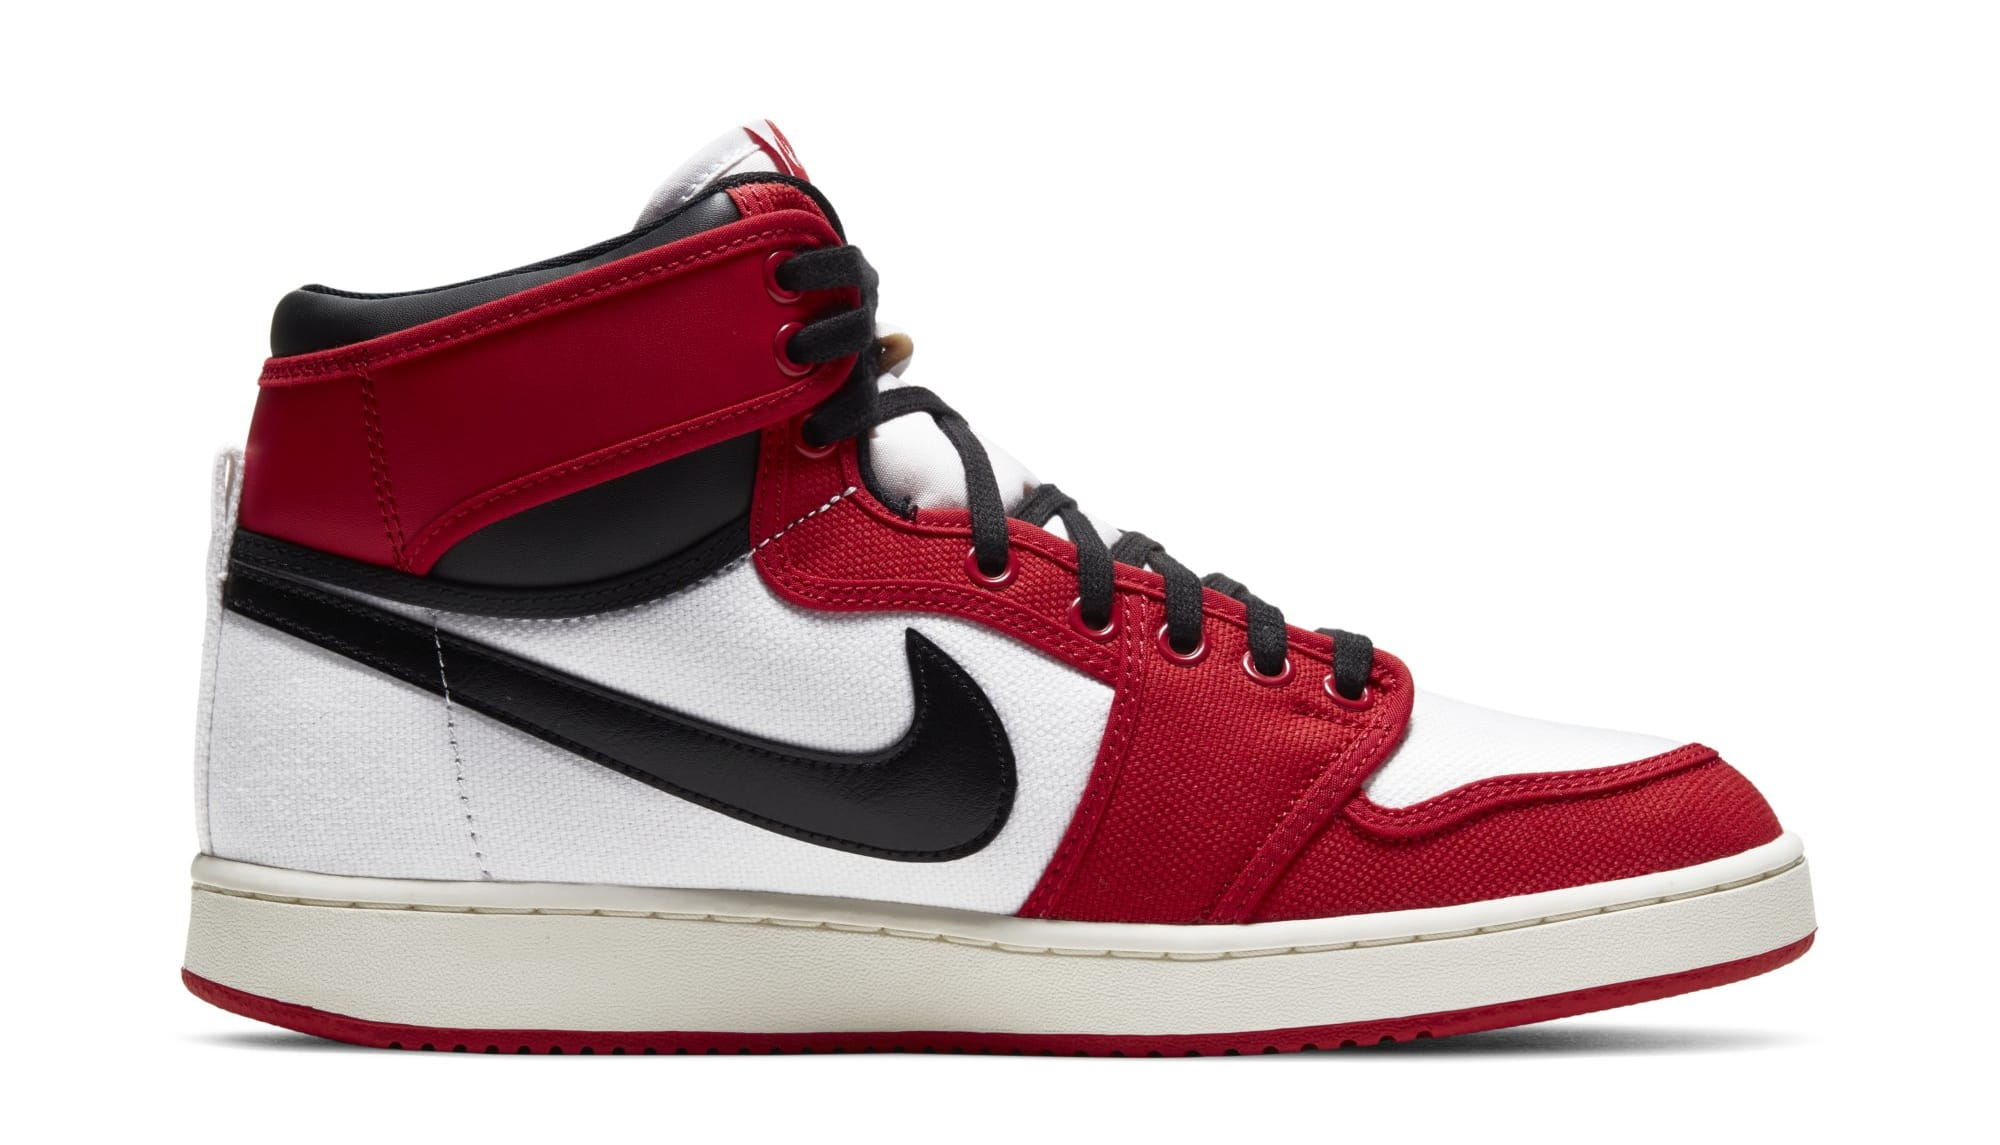 Air Jordan 1 KO 'Chicago' DA9089-100 (Medial)